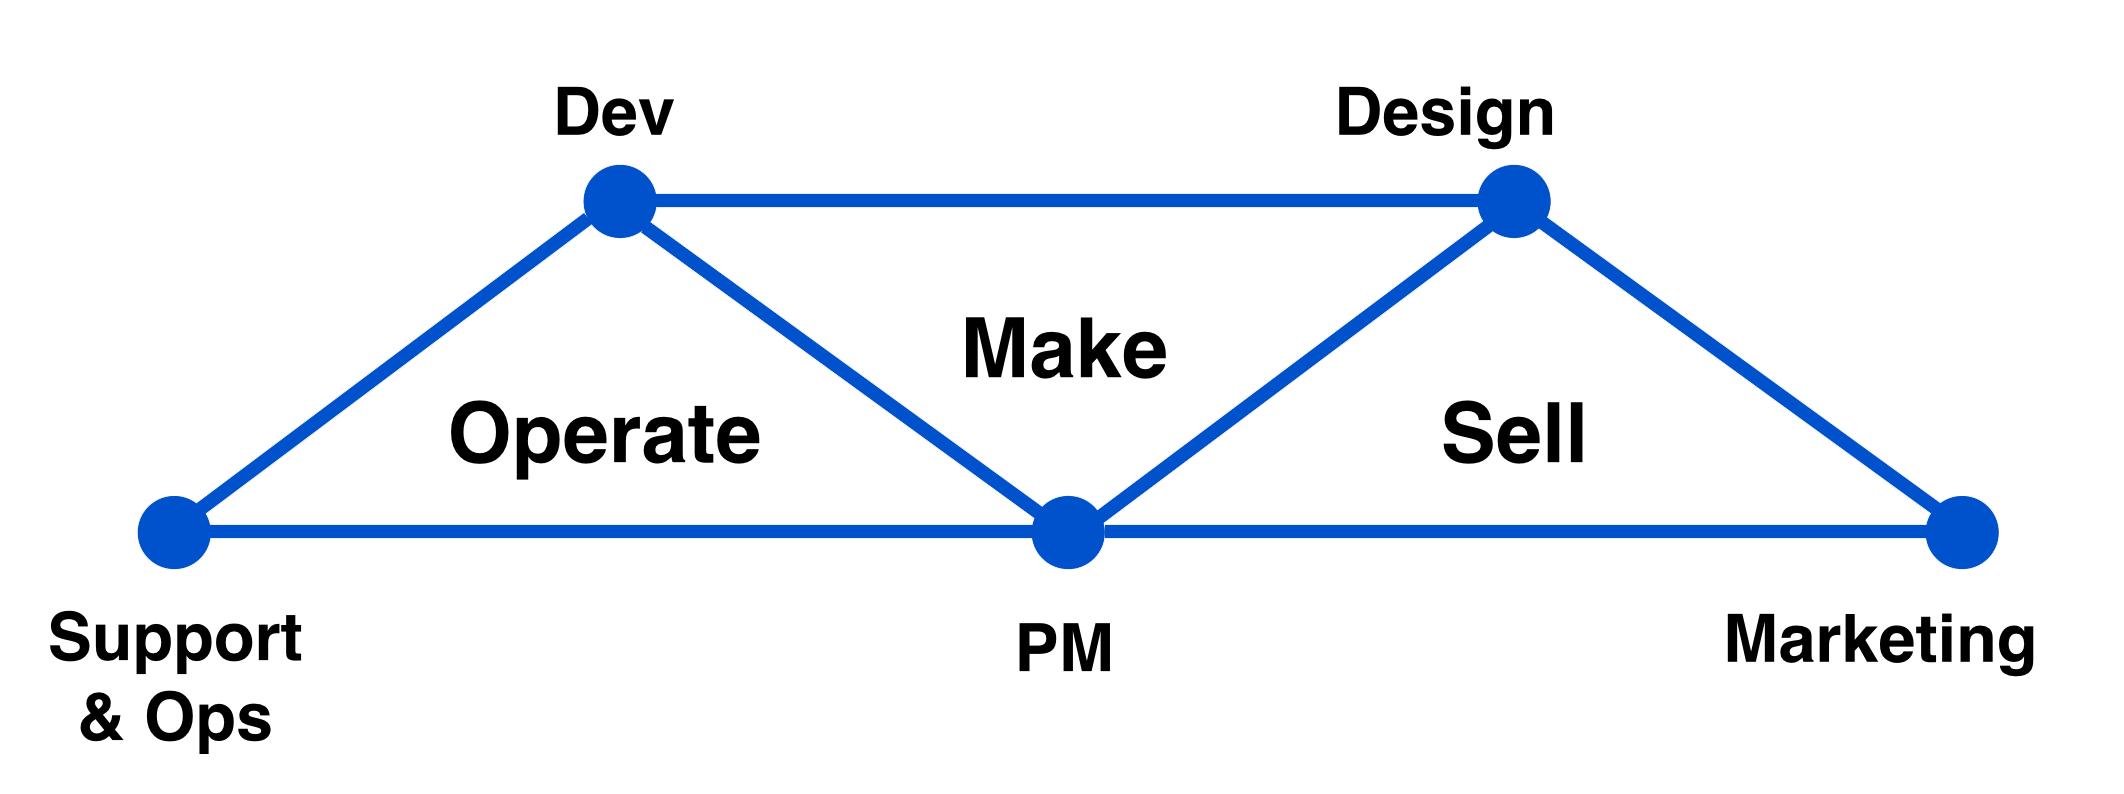 How to build a kick-ass agile team | Atlassian